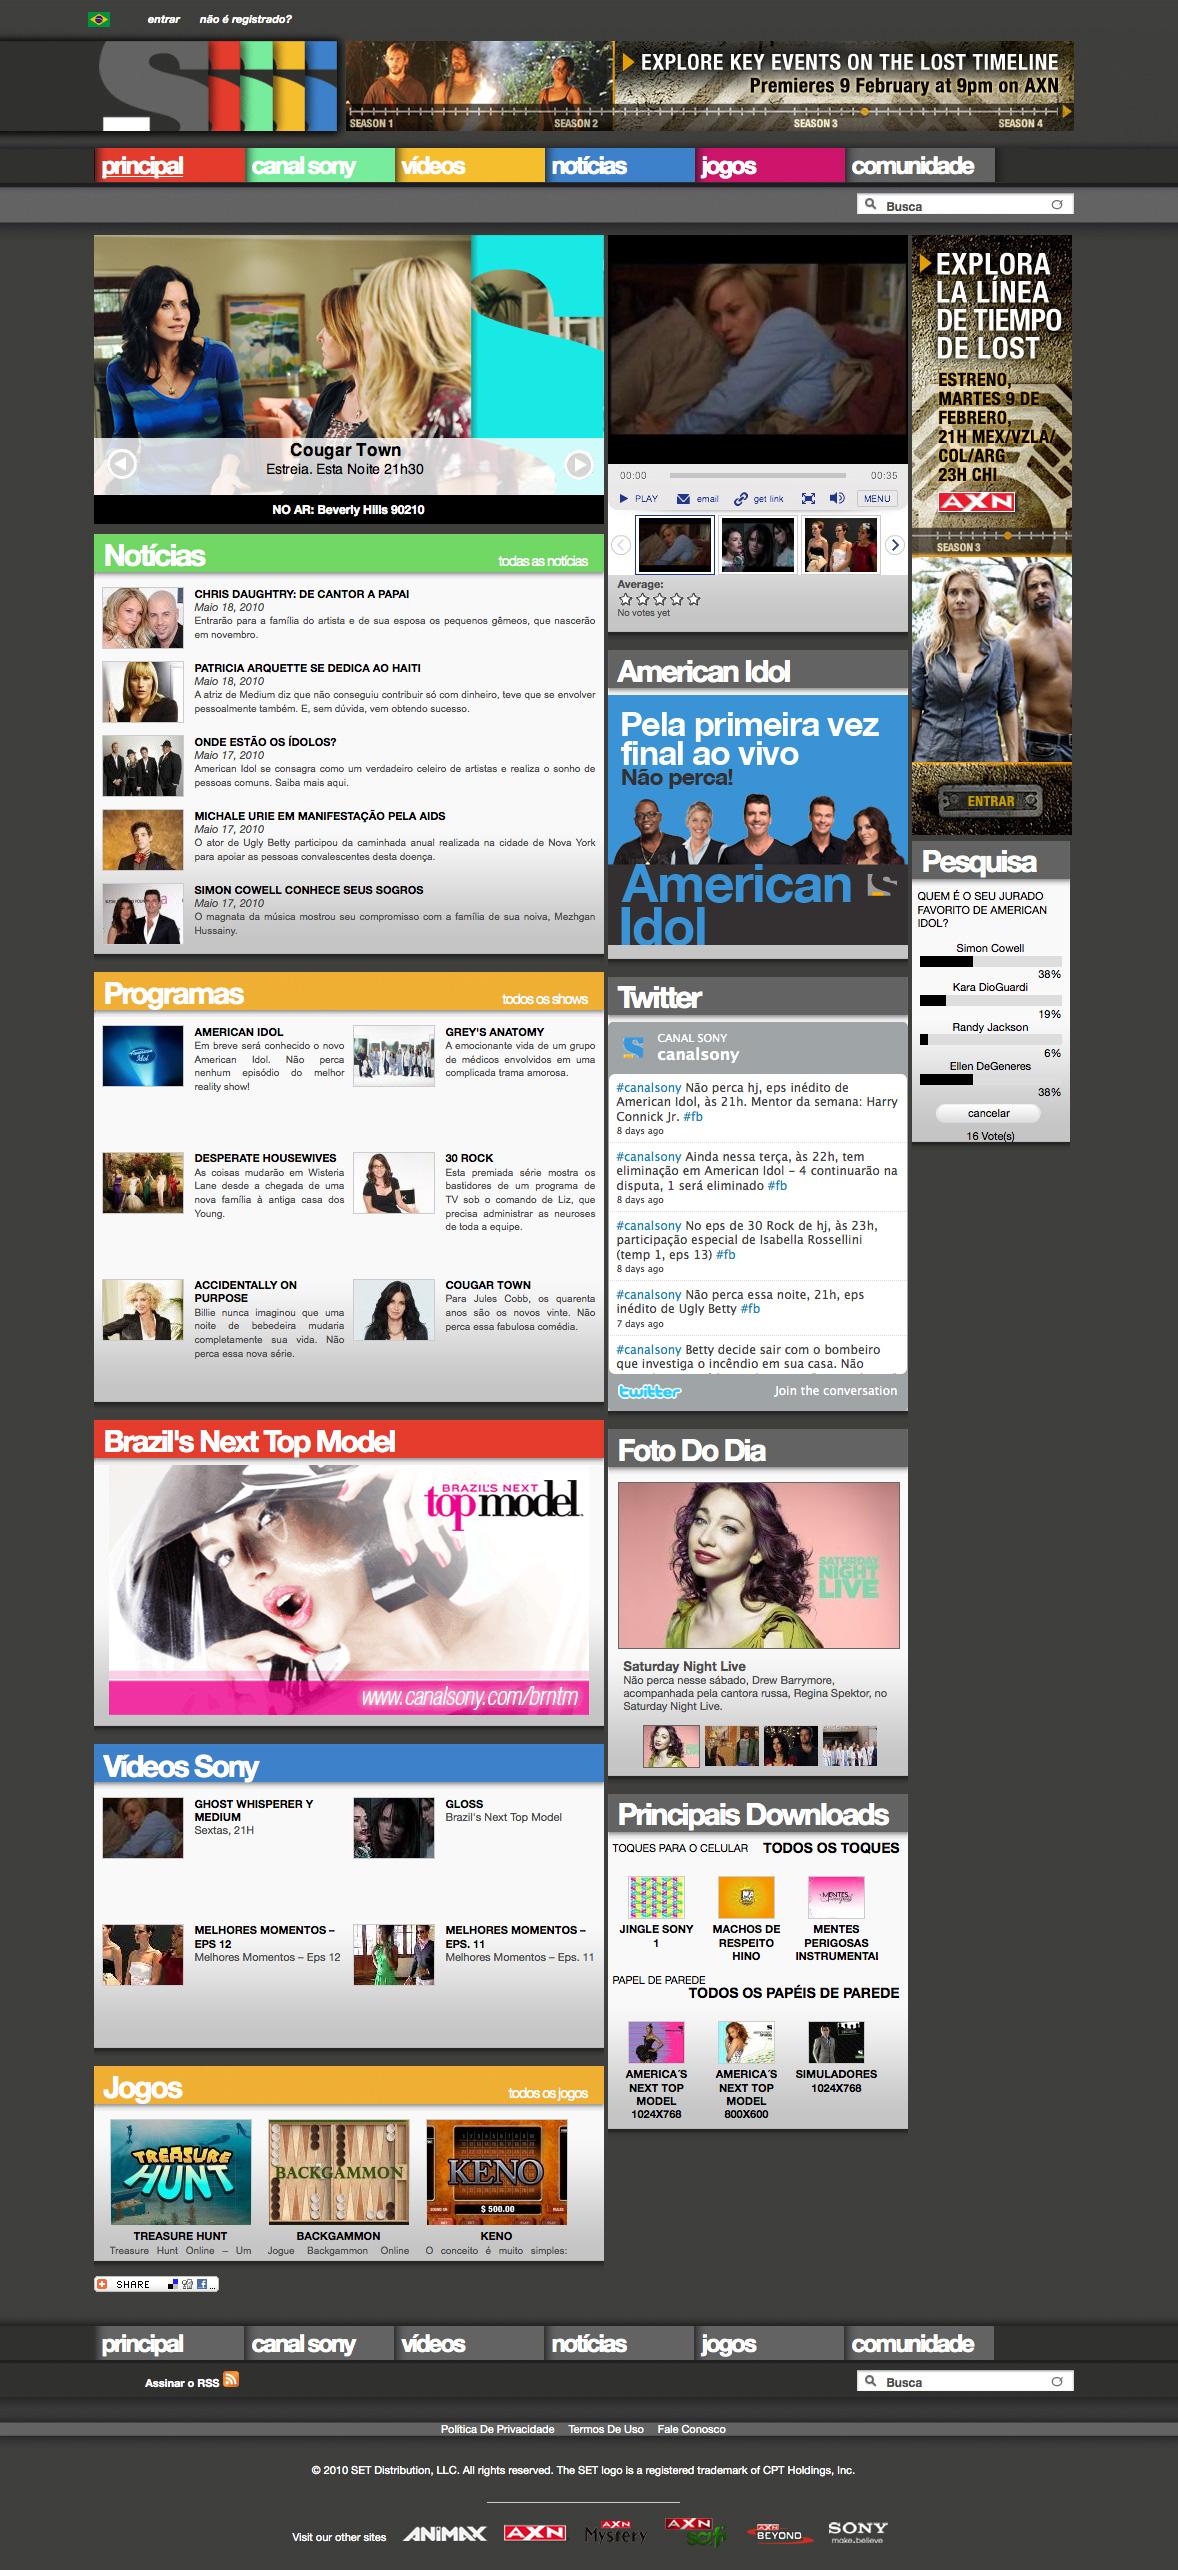 CanalSony.com – SET Latin America and Brazil